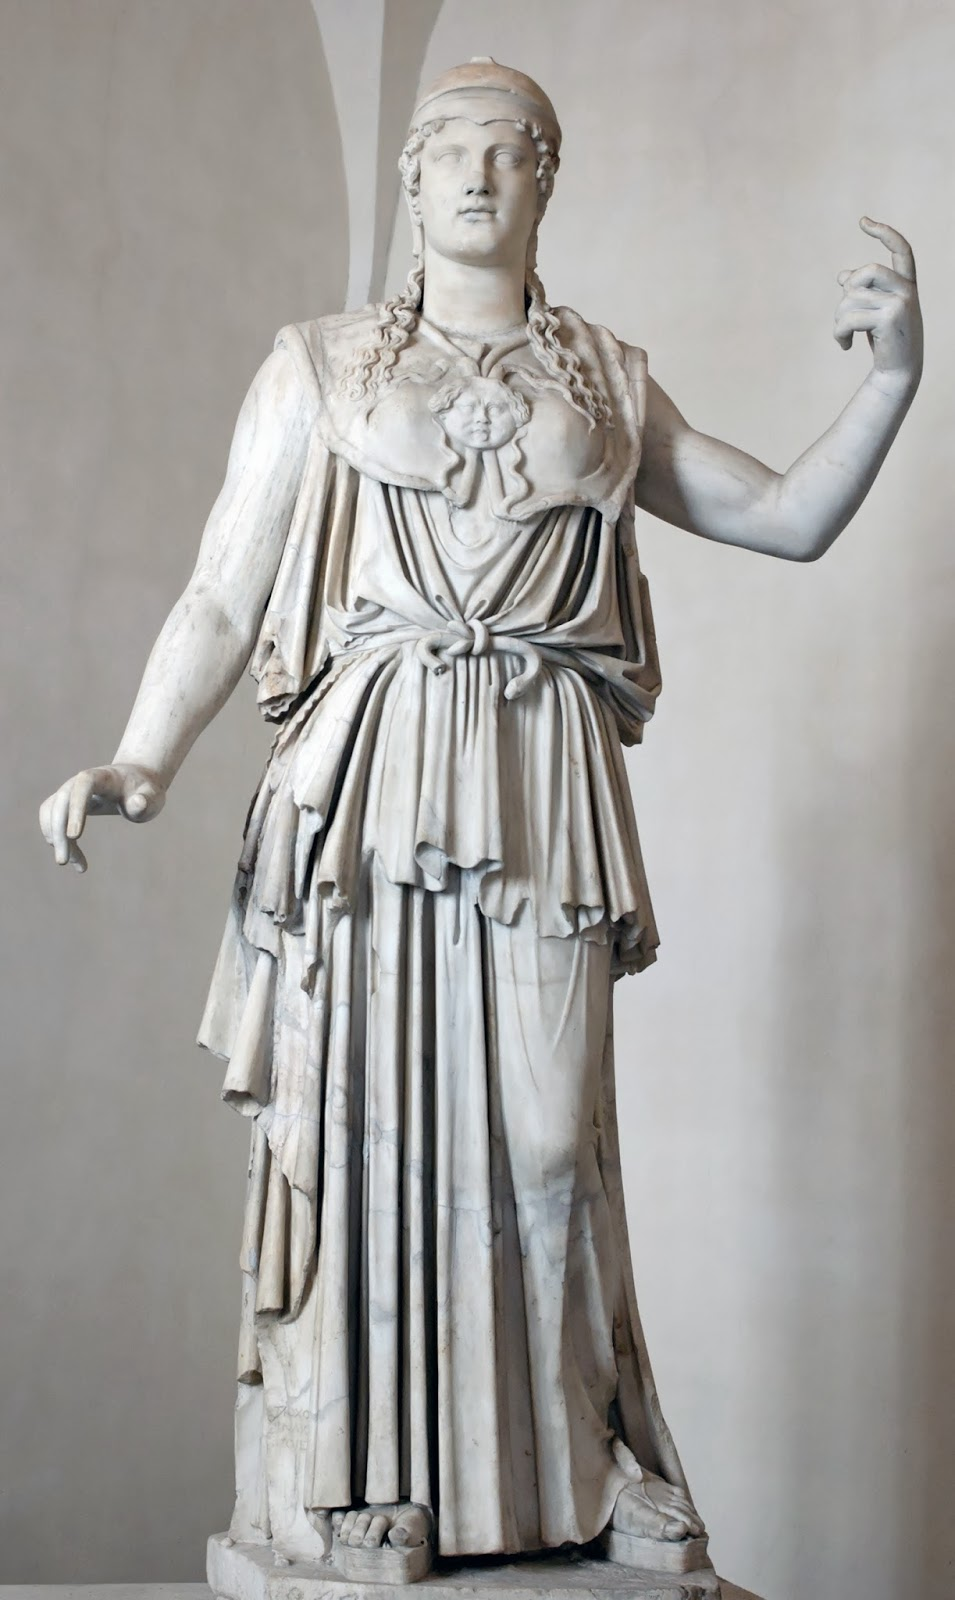 Greek God Of Arts And Crafts